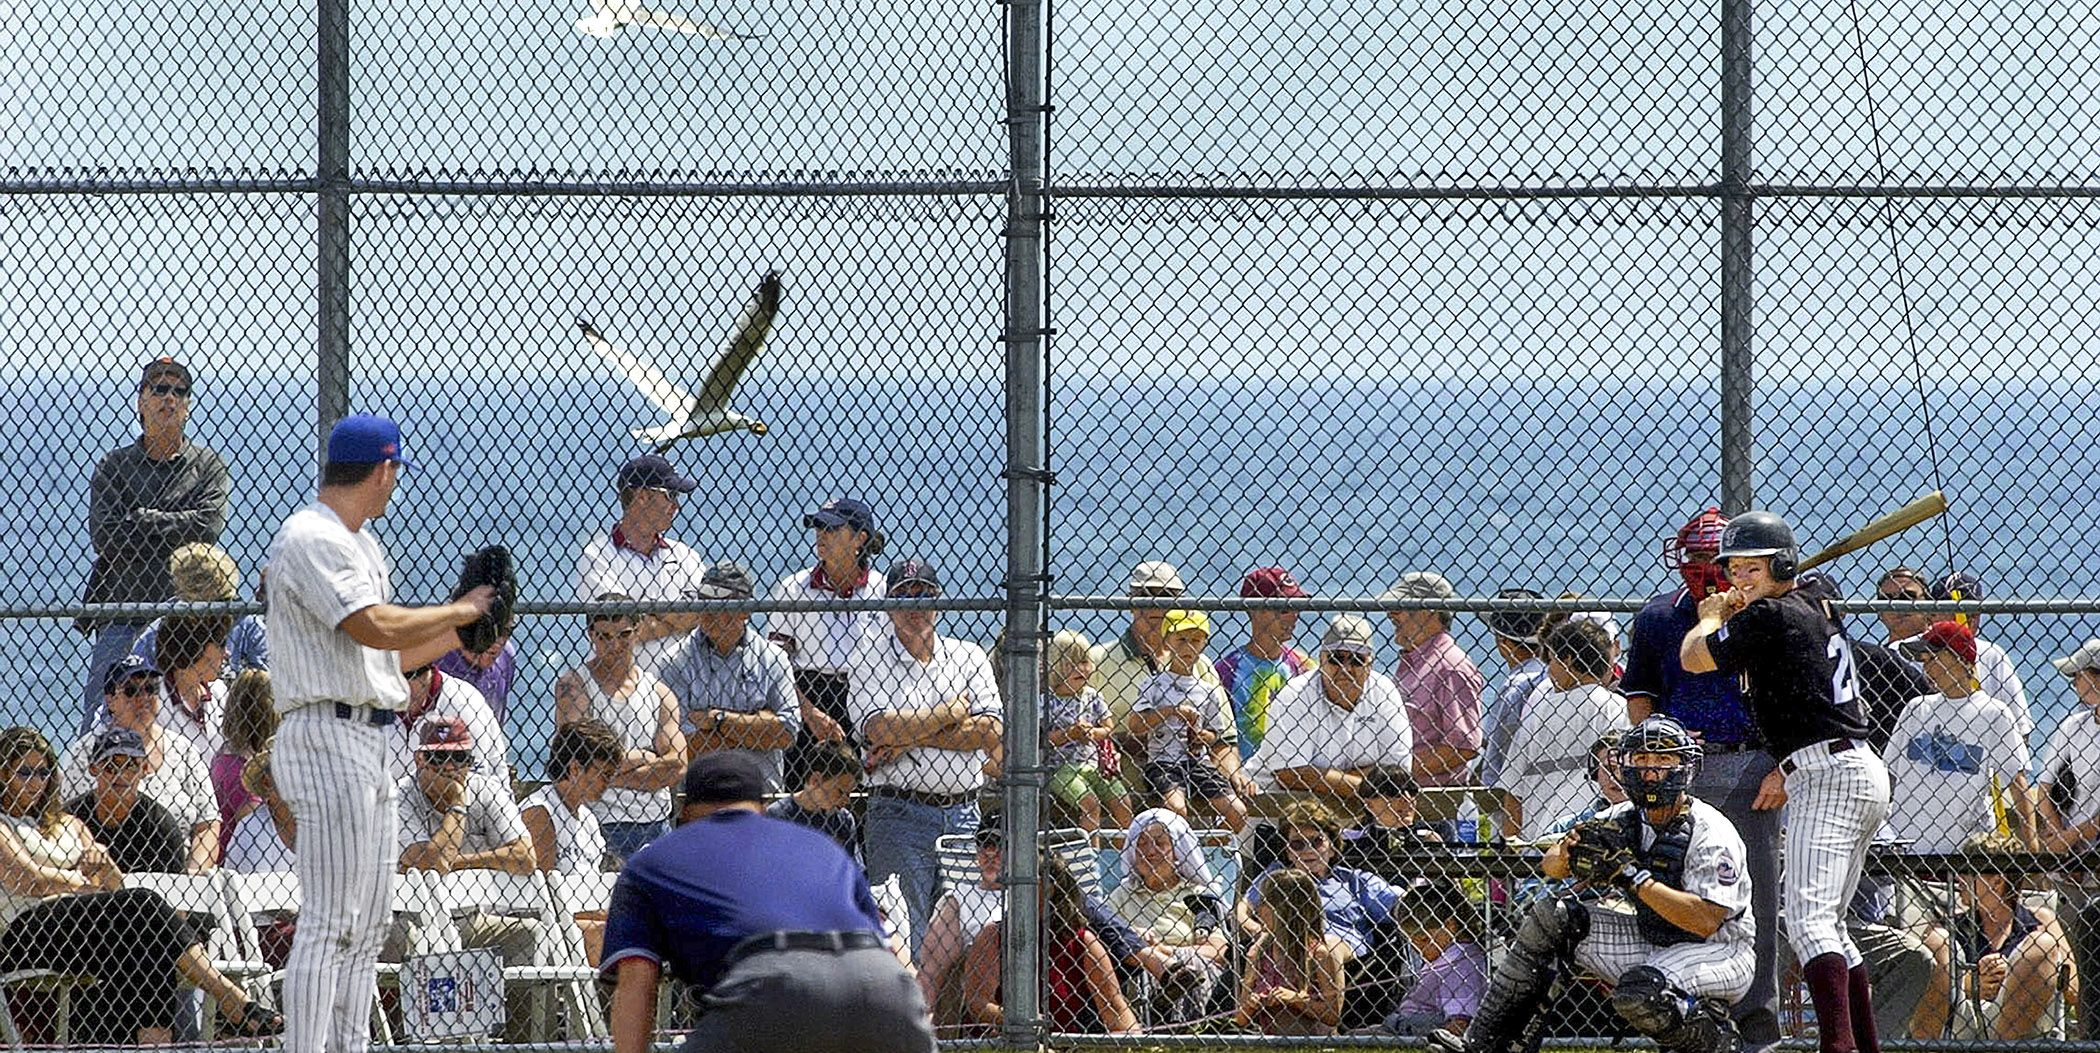 Top amateur baseball tournments